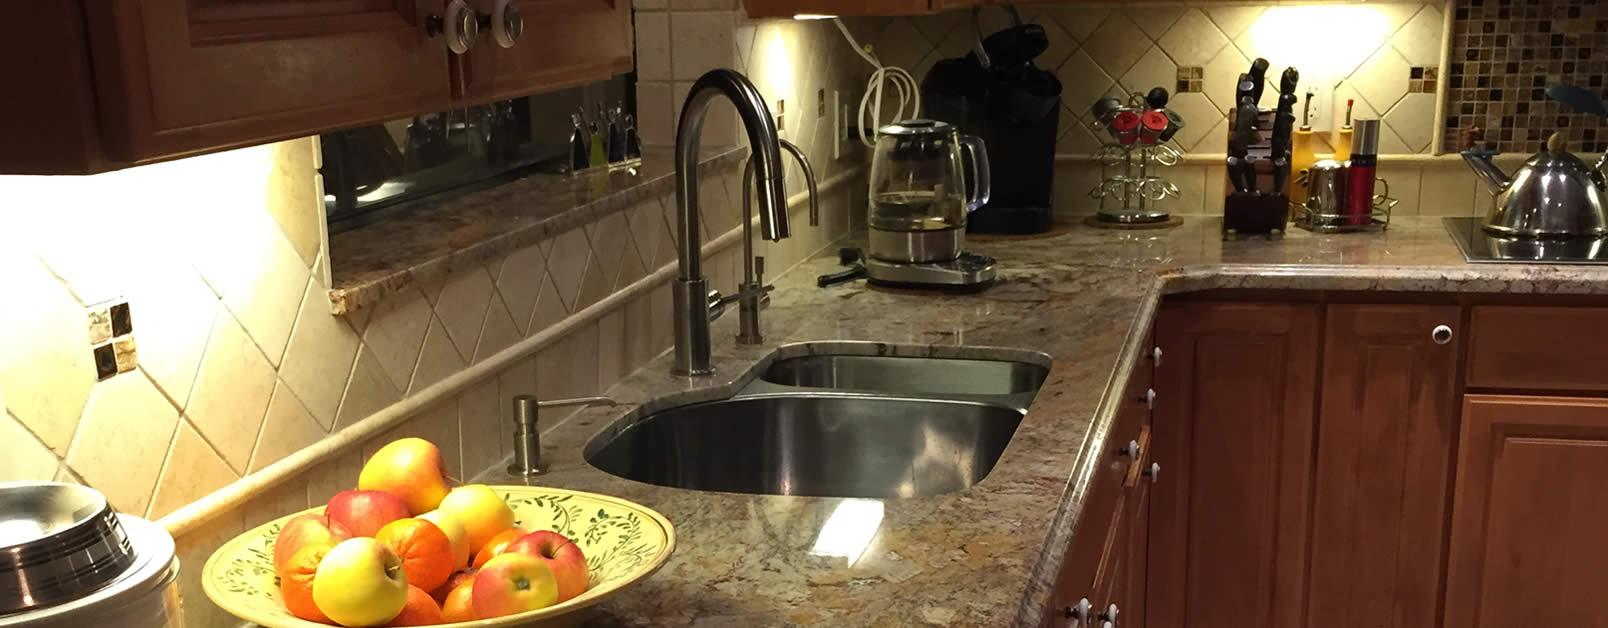 Home - C A S Granite, Quartzite, Marble & Quartz Countertops - South